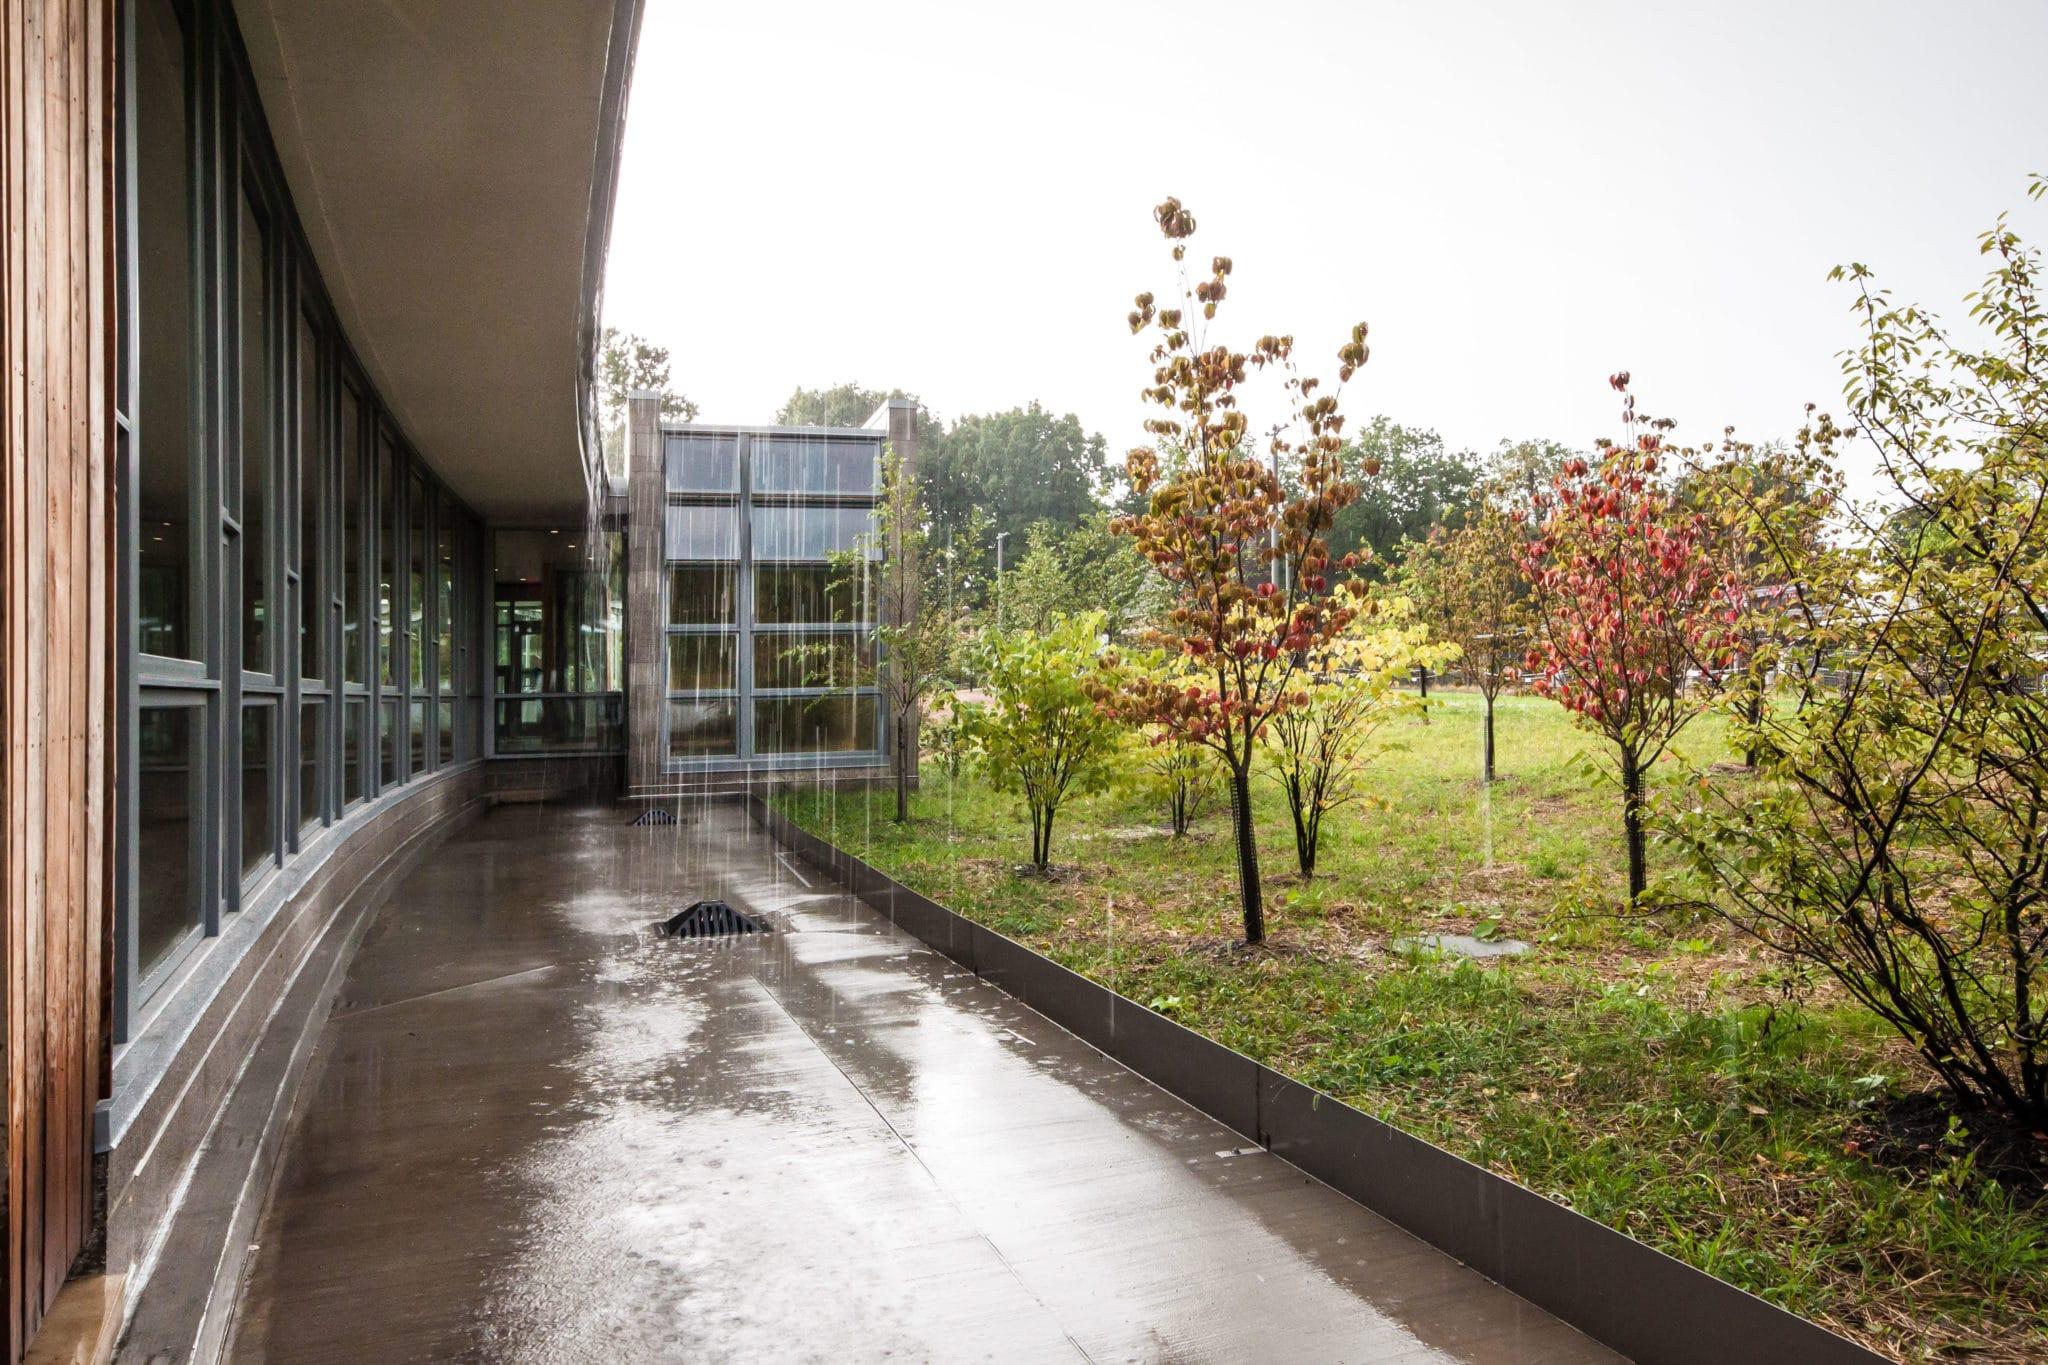 Rain ravine at the Frick Environmental Center